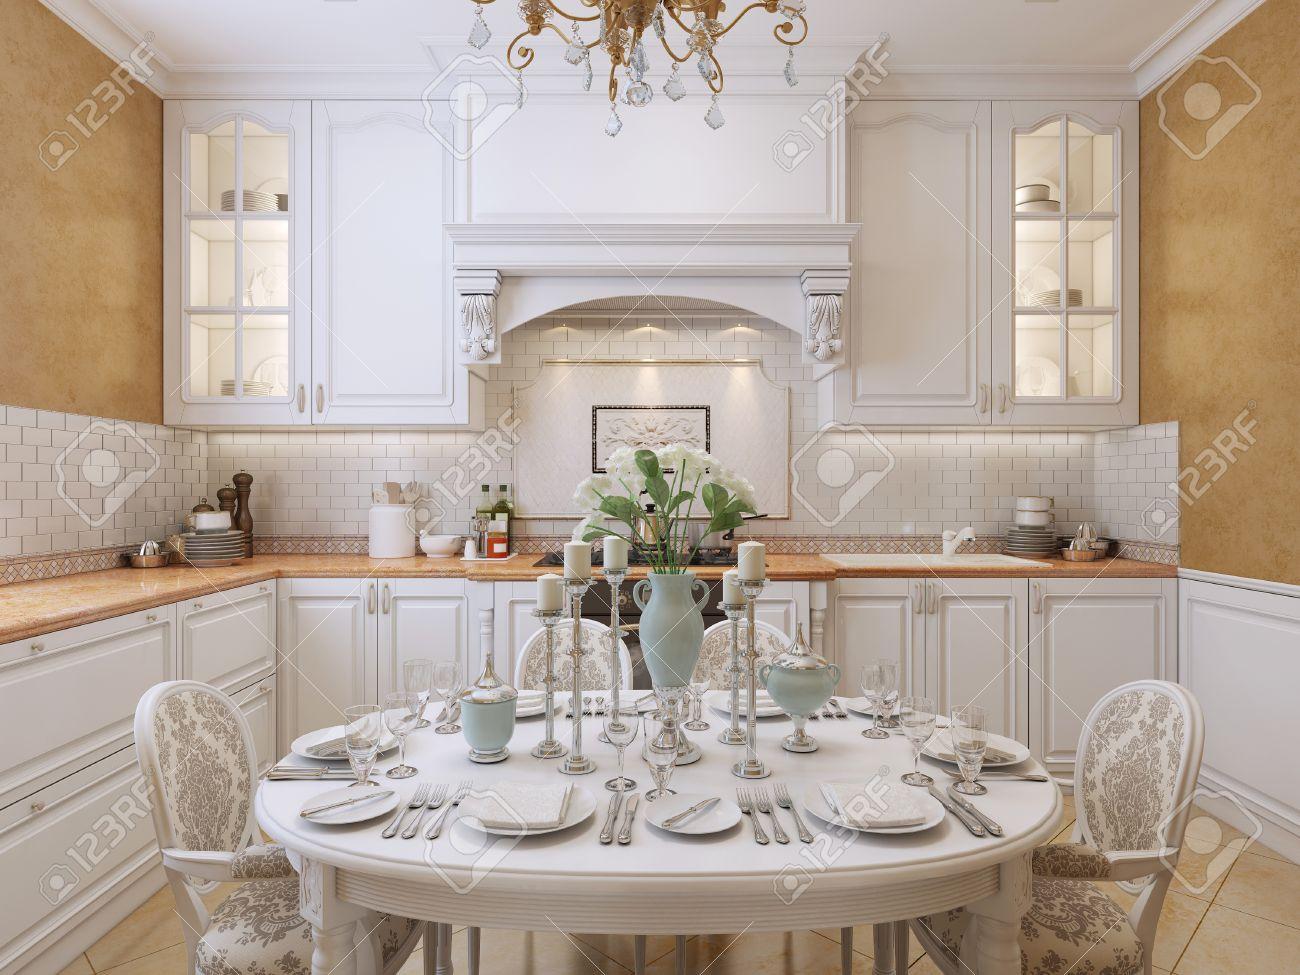 Awesome Cucina Stile Barocco Veneziano Pictures - Ameripest.us ...